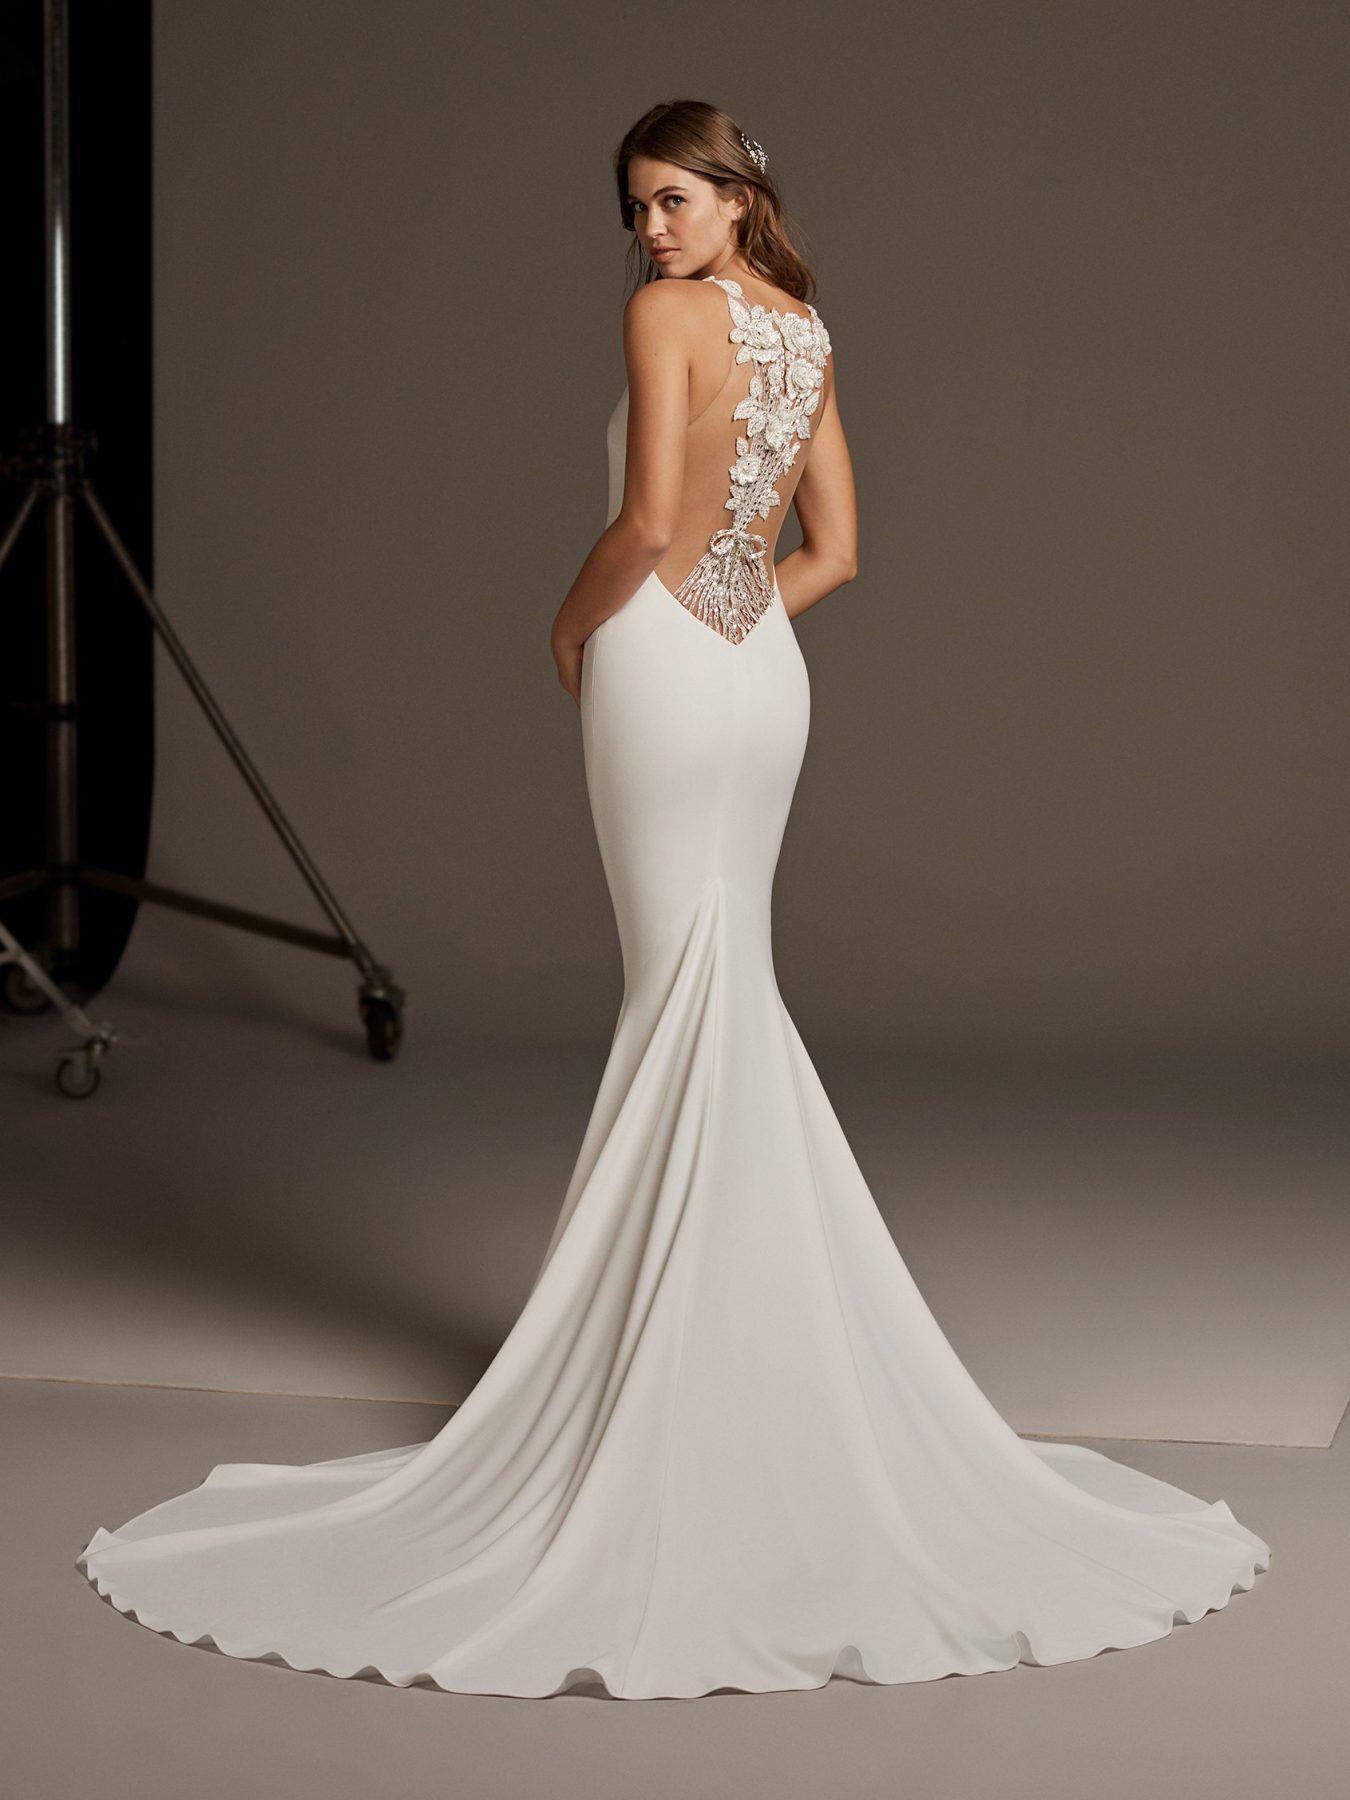 Sleevless Simple Dress With Lace Illusion Back Kleinfeld Bridal Pronovias Wedding Dress Bridal Gowns Mermaid Wedding Dress [ 1800 x 1350 Pixel ]